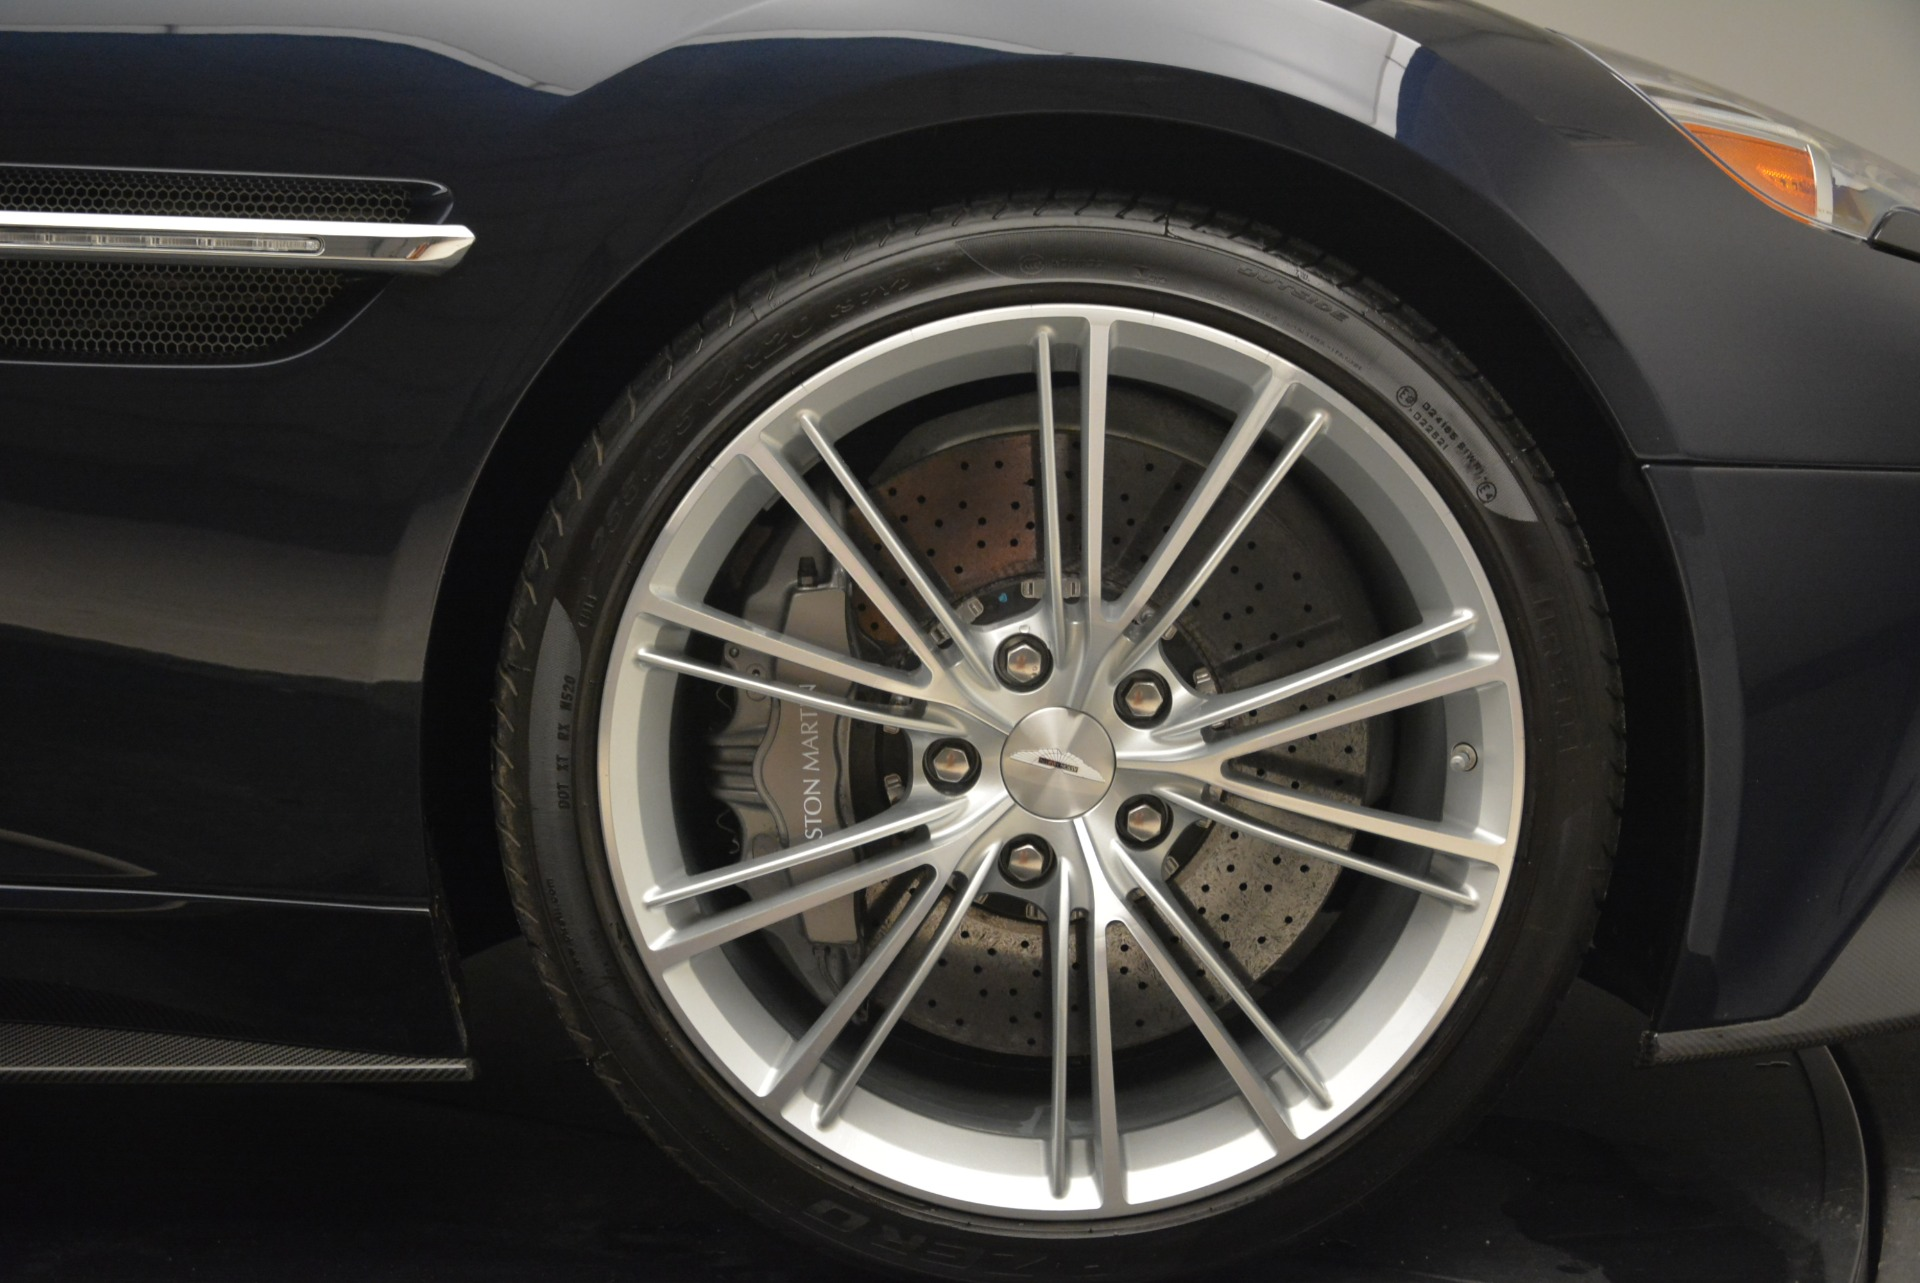 Used 2014 Aston Martin Vanquish Volante For Sale In Greenwich, CT 2097_p28